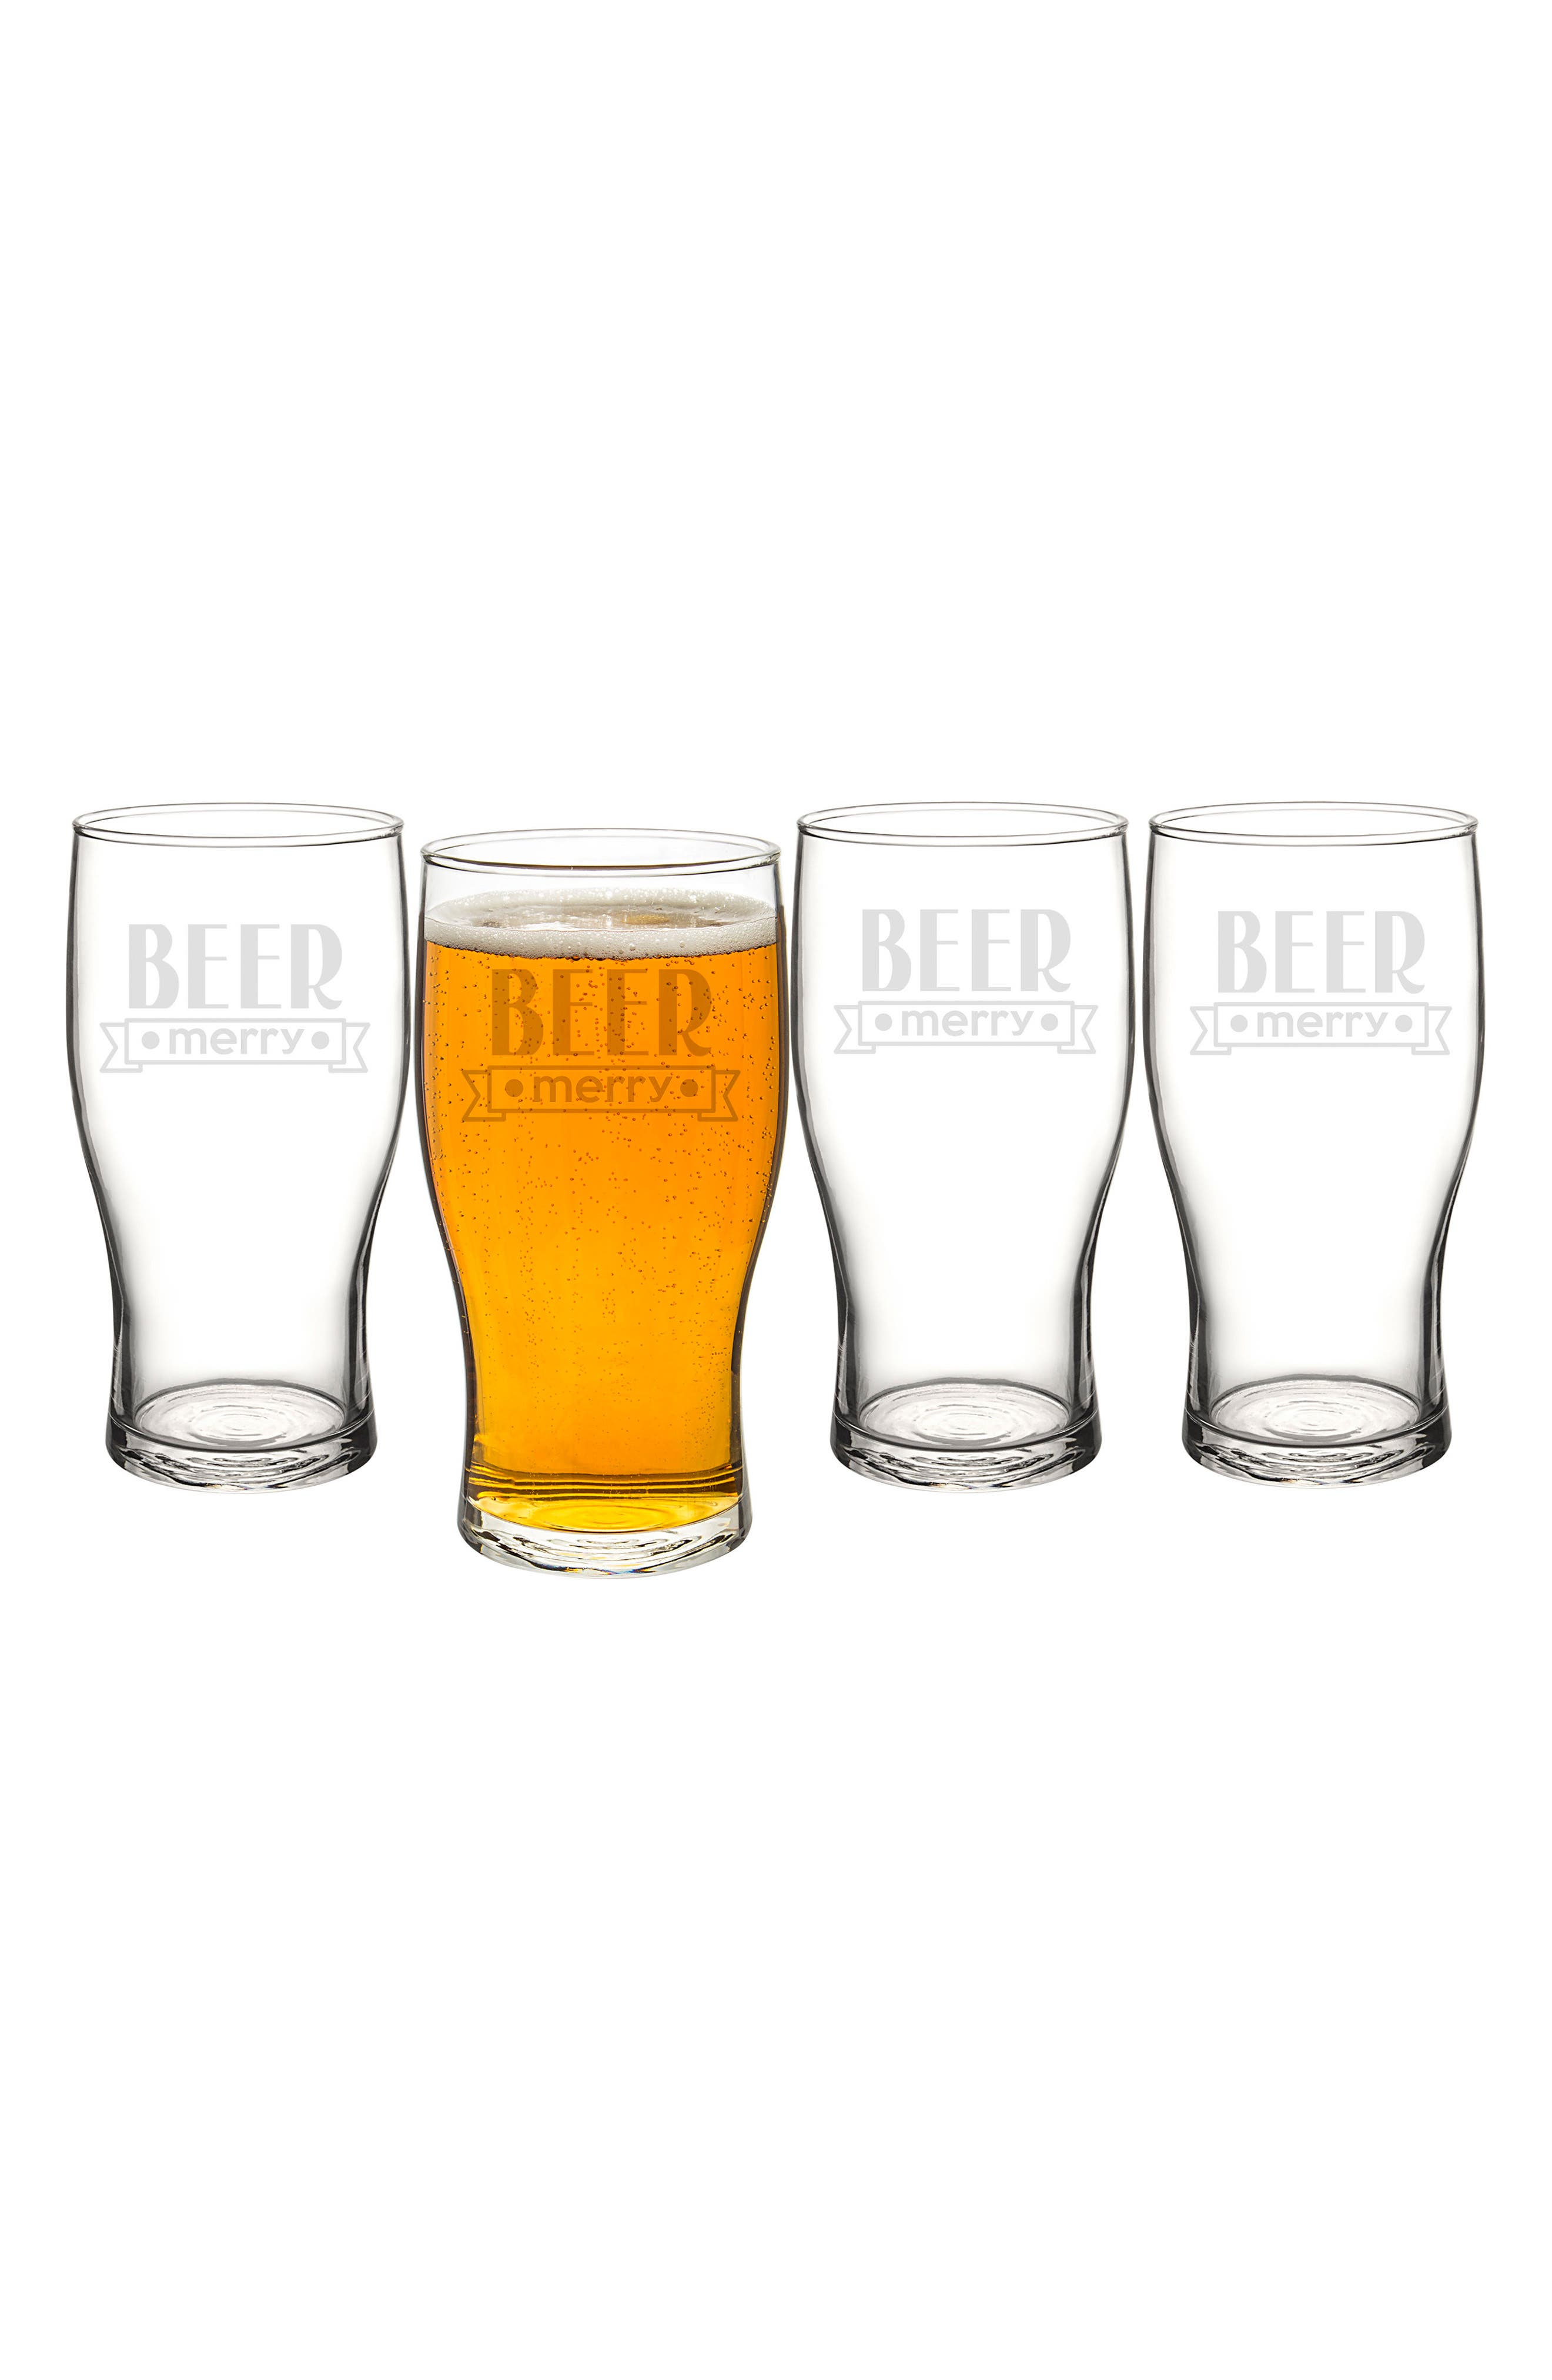 Beer Merry Set of 4 Pilsner Glasses,                         Main,                         color, CLEAR